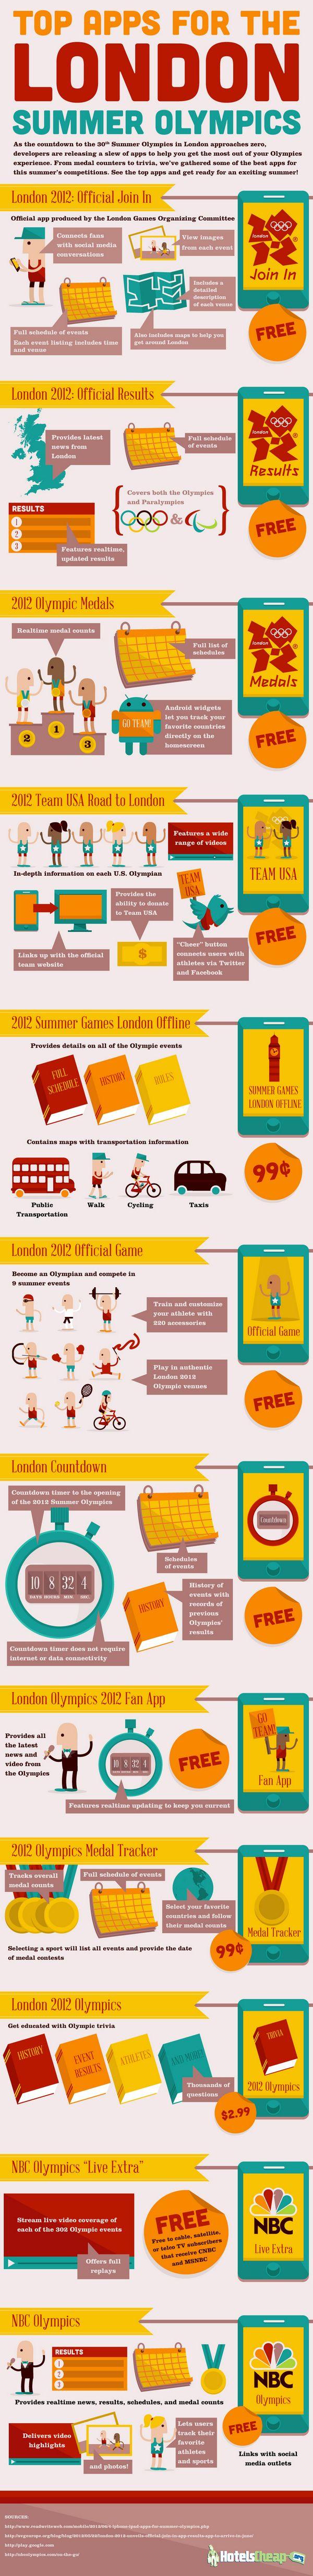 London Summer Olympics Apps